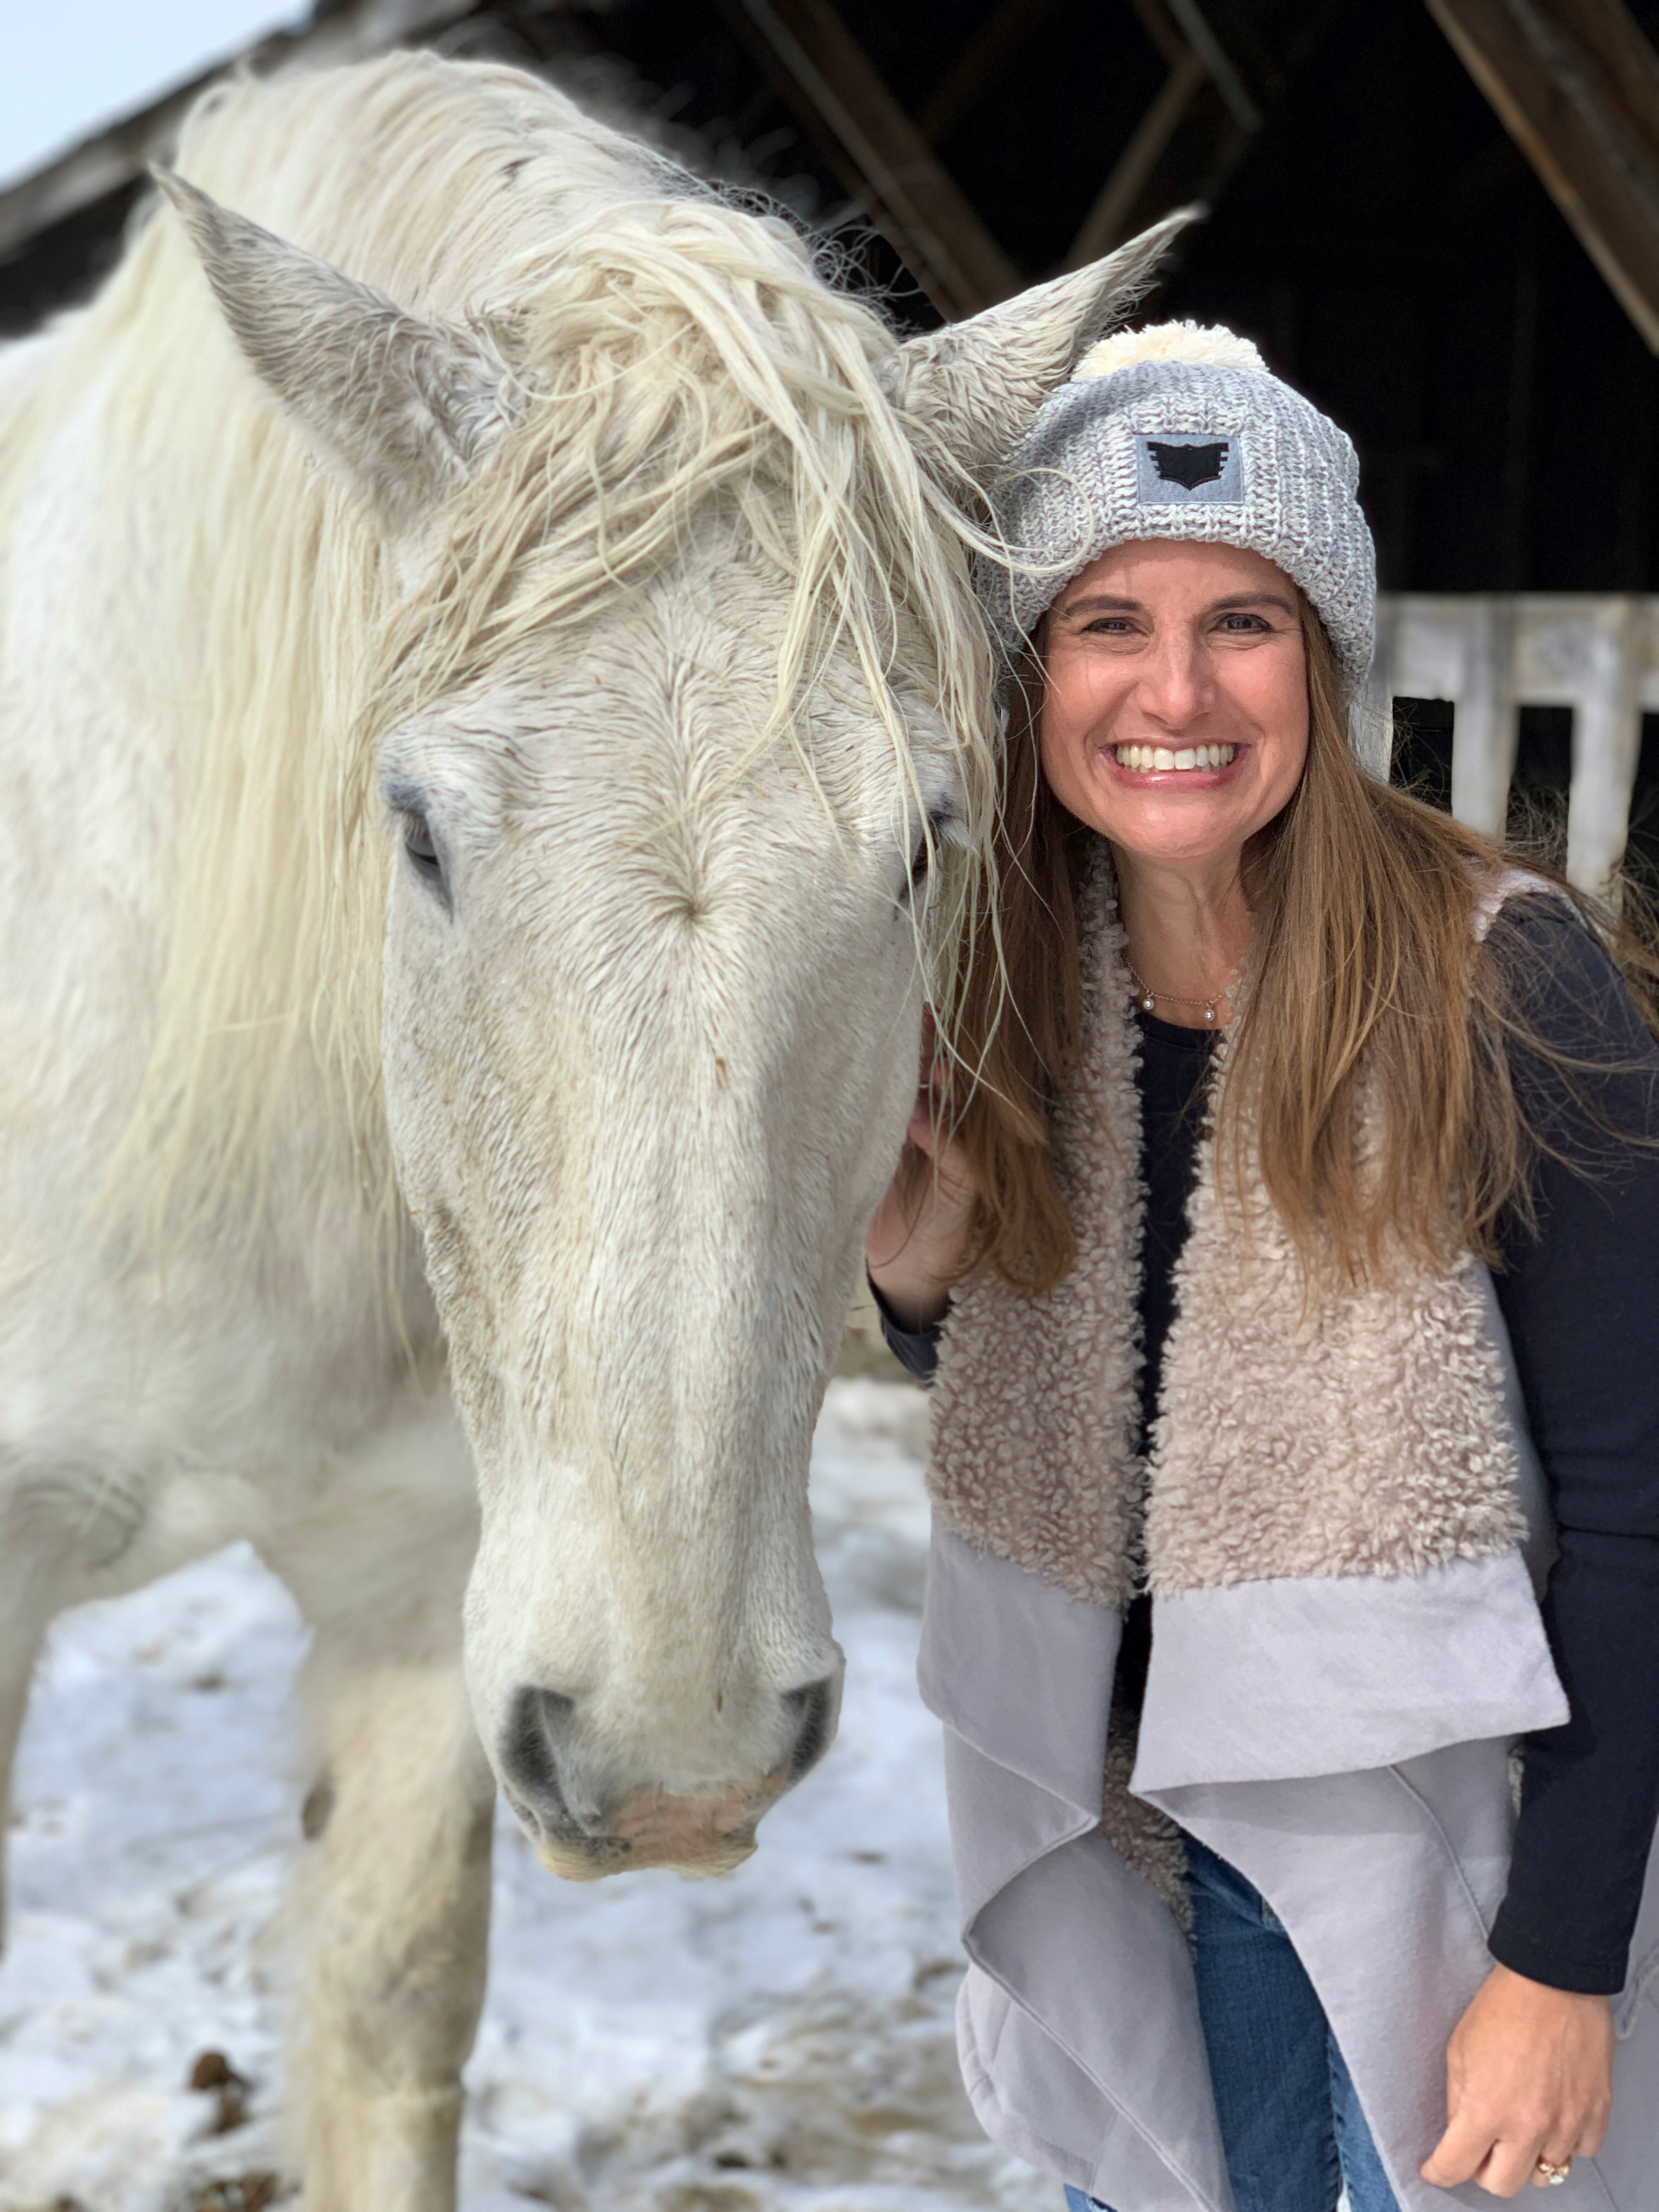 Kate Loecken, Achieve Equine Administrative Services